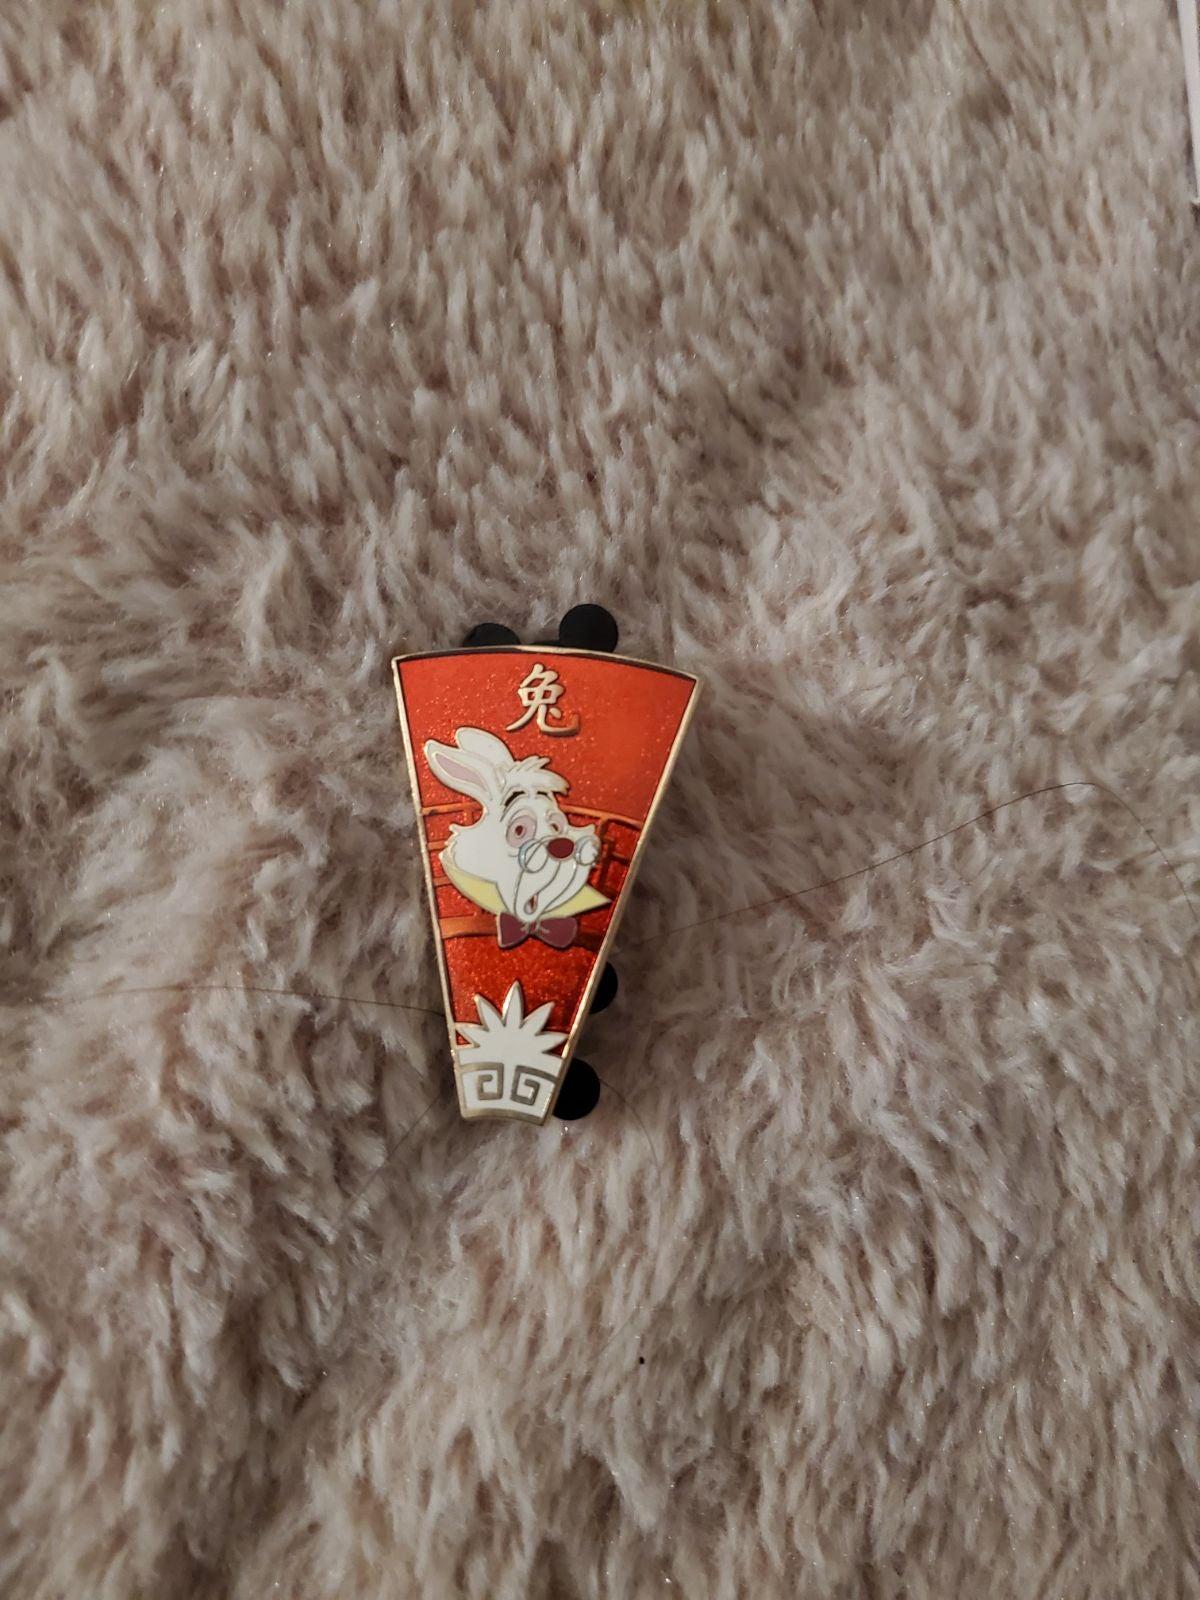 Chinese Zodiac calendar disney pin colle